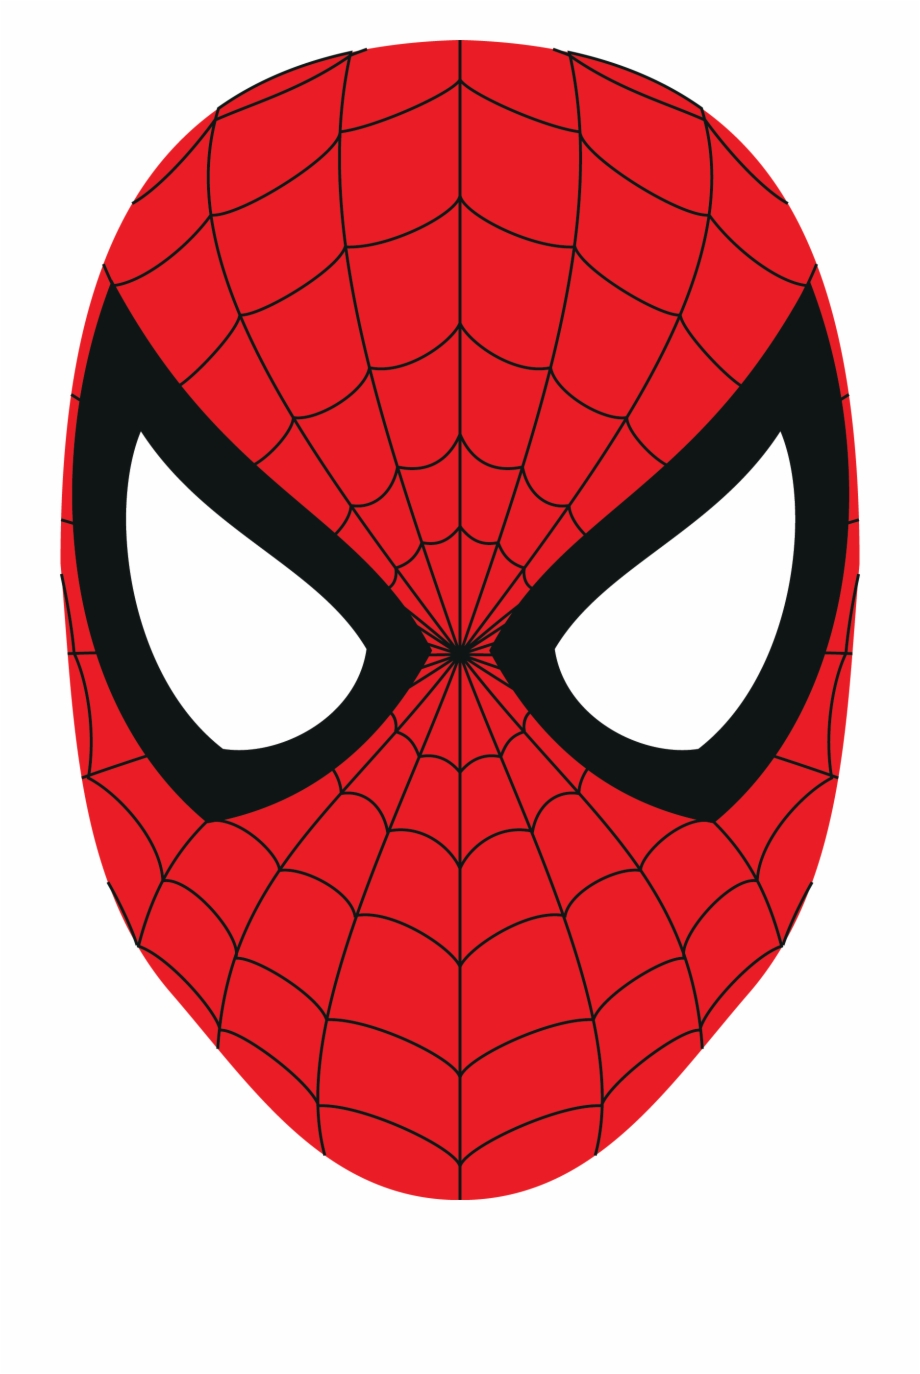 Spiderman clipart face svg transparent Enter Image Description Here - Spiderman Face Png Free PNG ... svg transparent